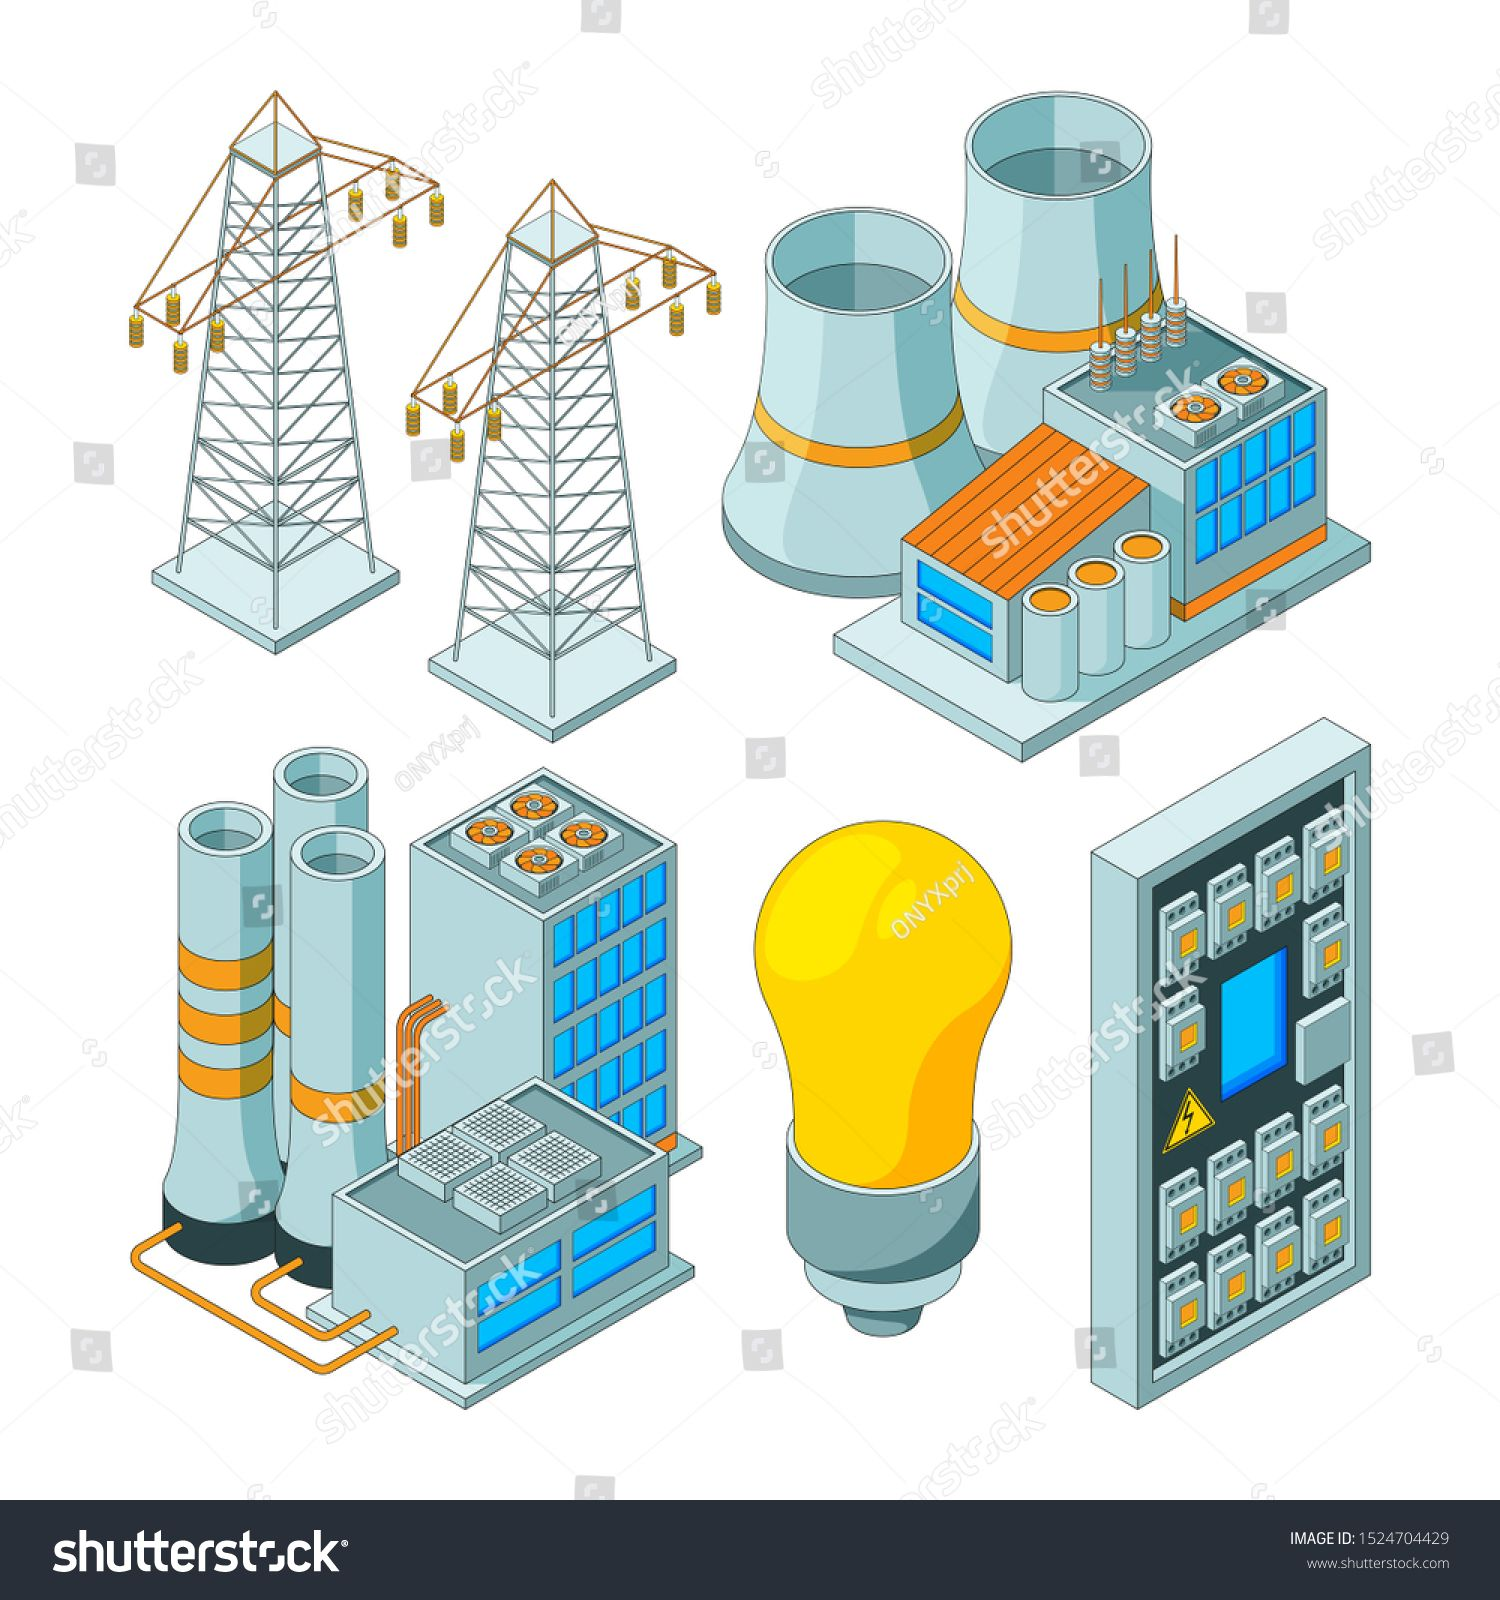 Energy Electric System Power Lighting Generators Saving Electrical Light Tools Isometric Illustrations Royalty Free I Isometric Illustration Electricity Power